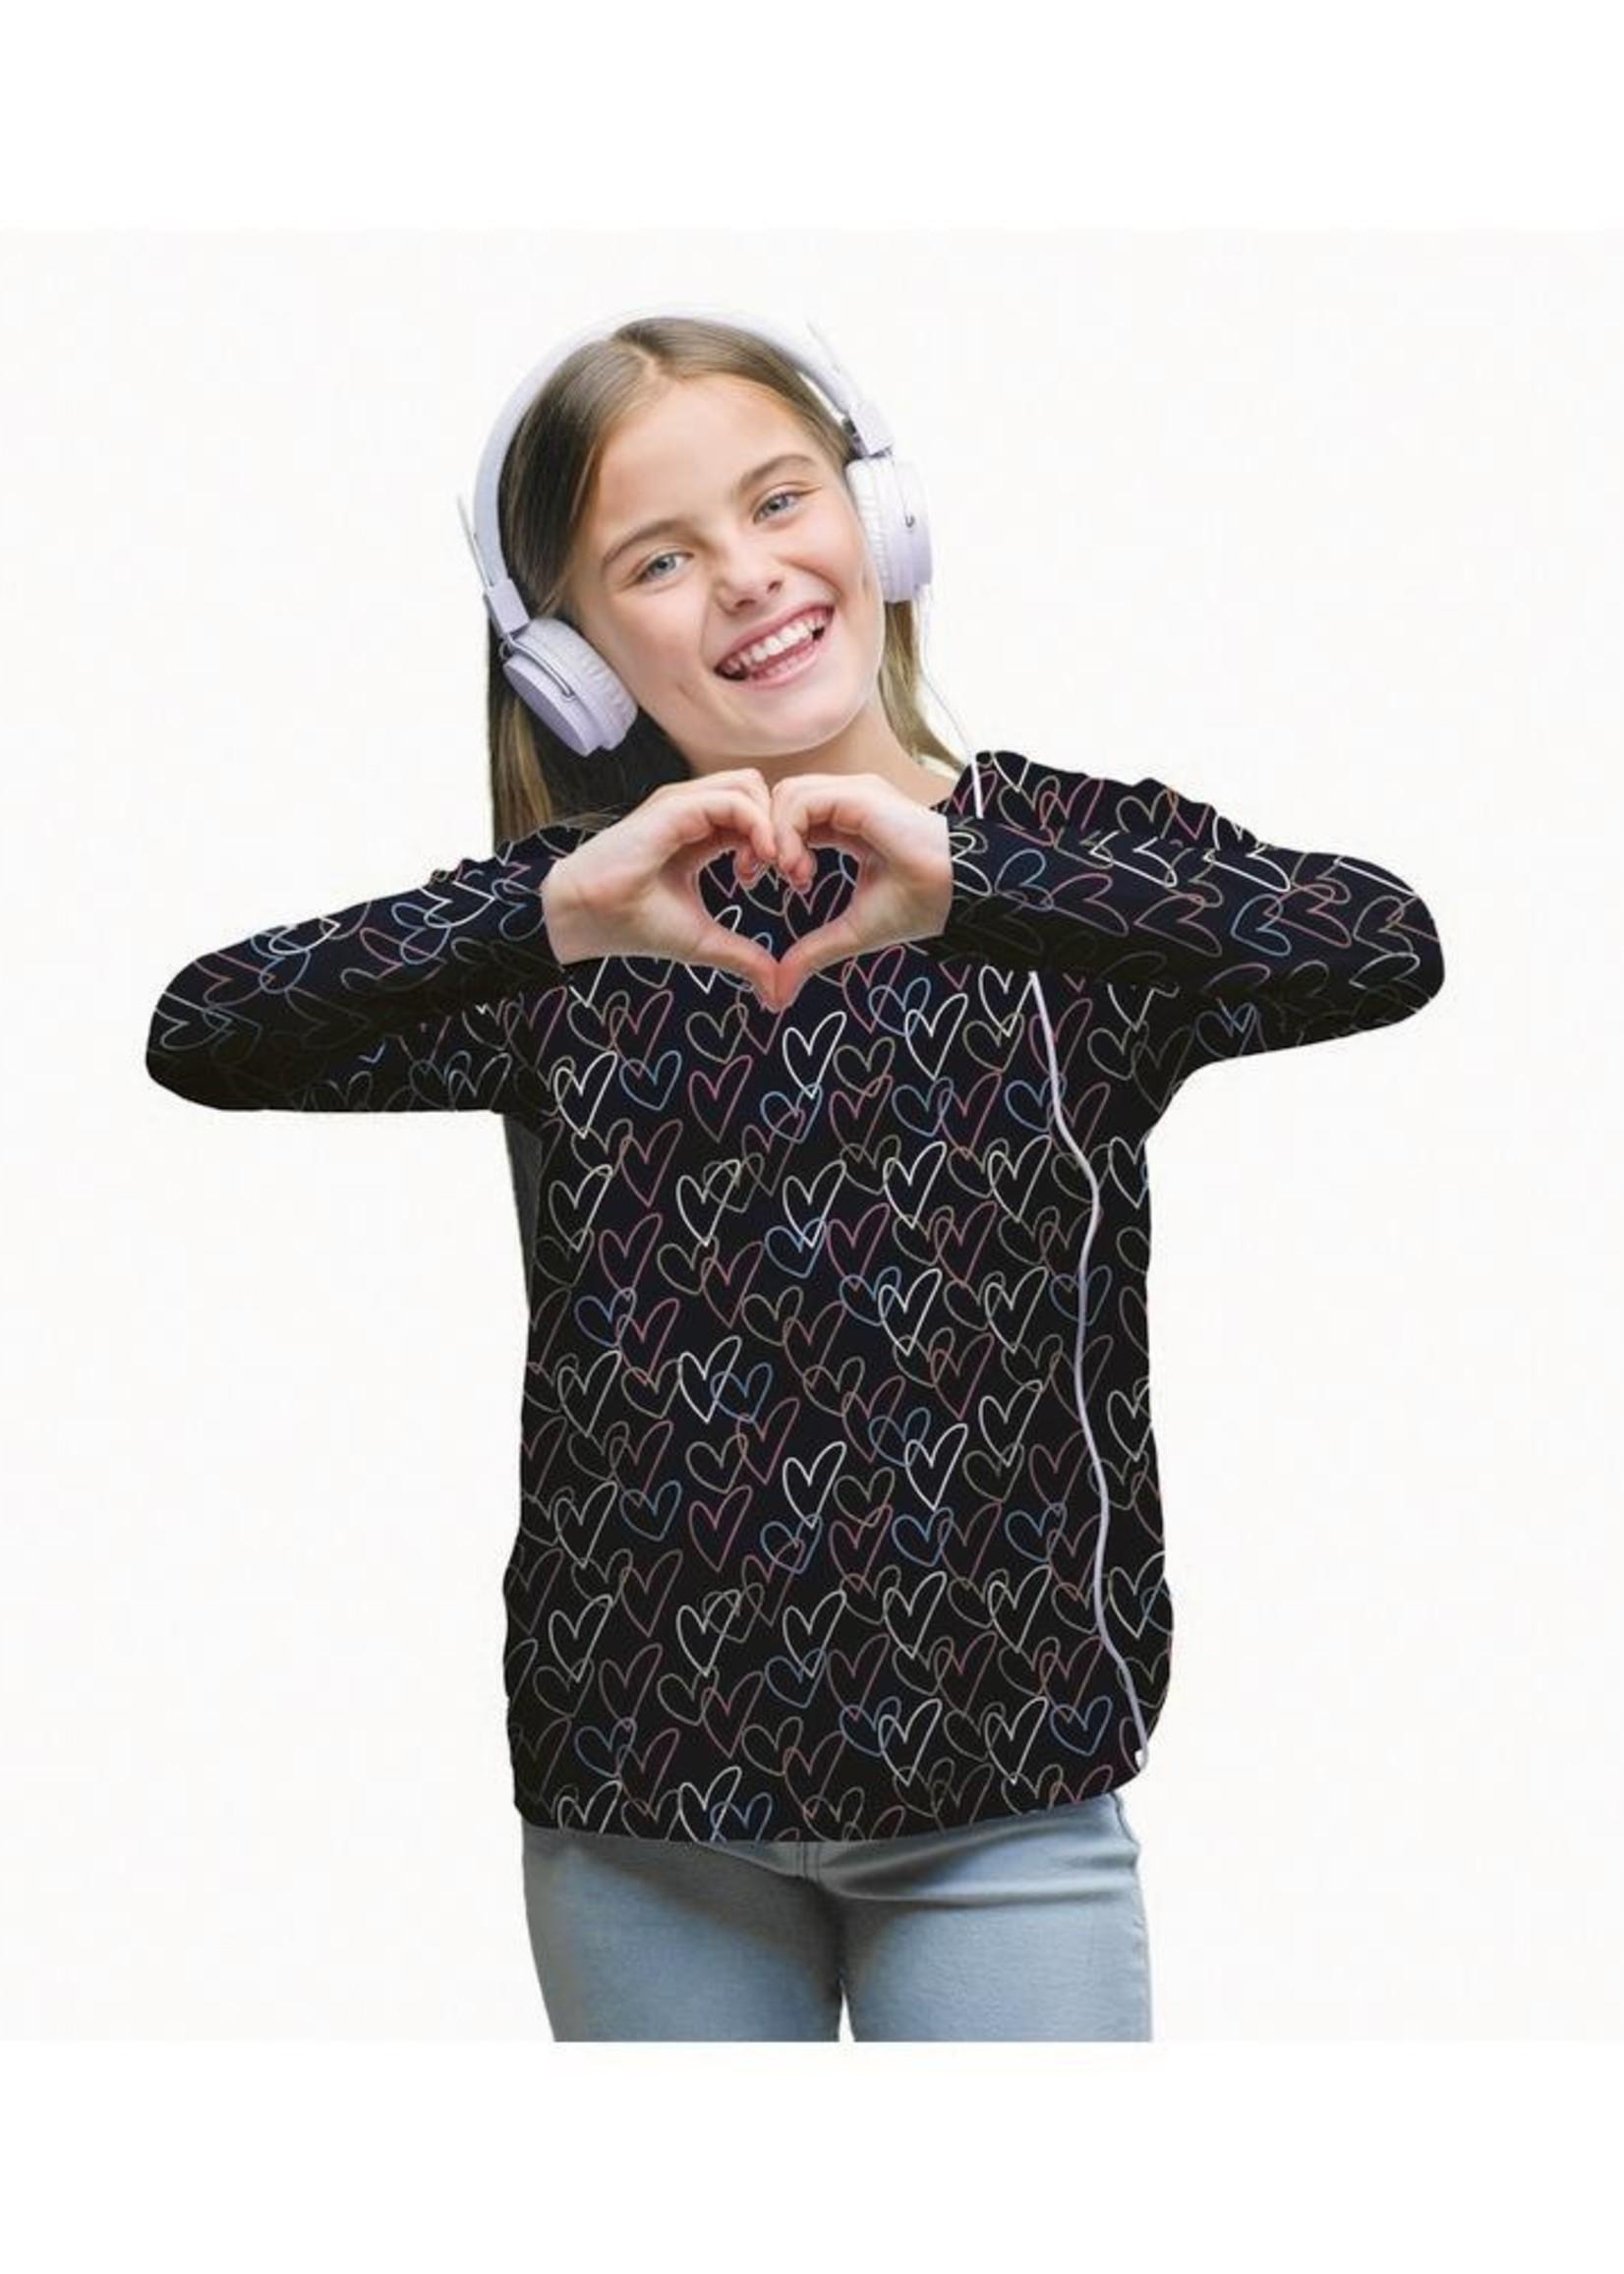 Poppy JERSEY GLITTER HEARTS NAVY